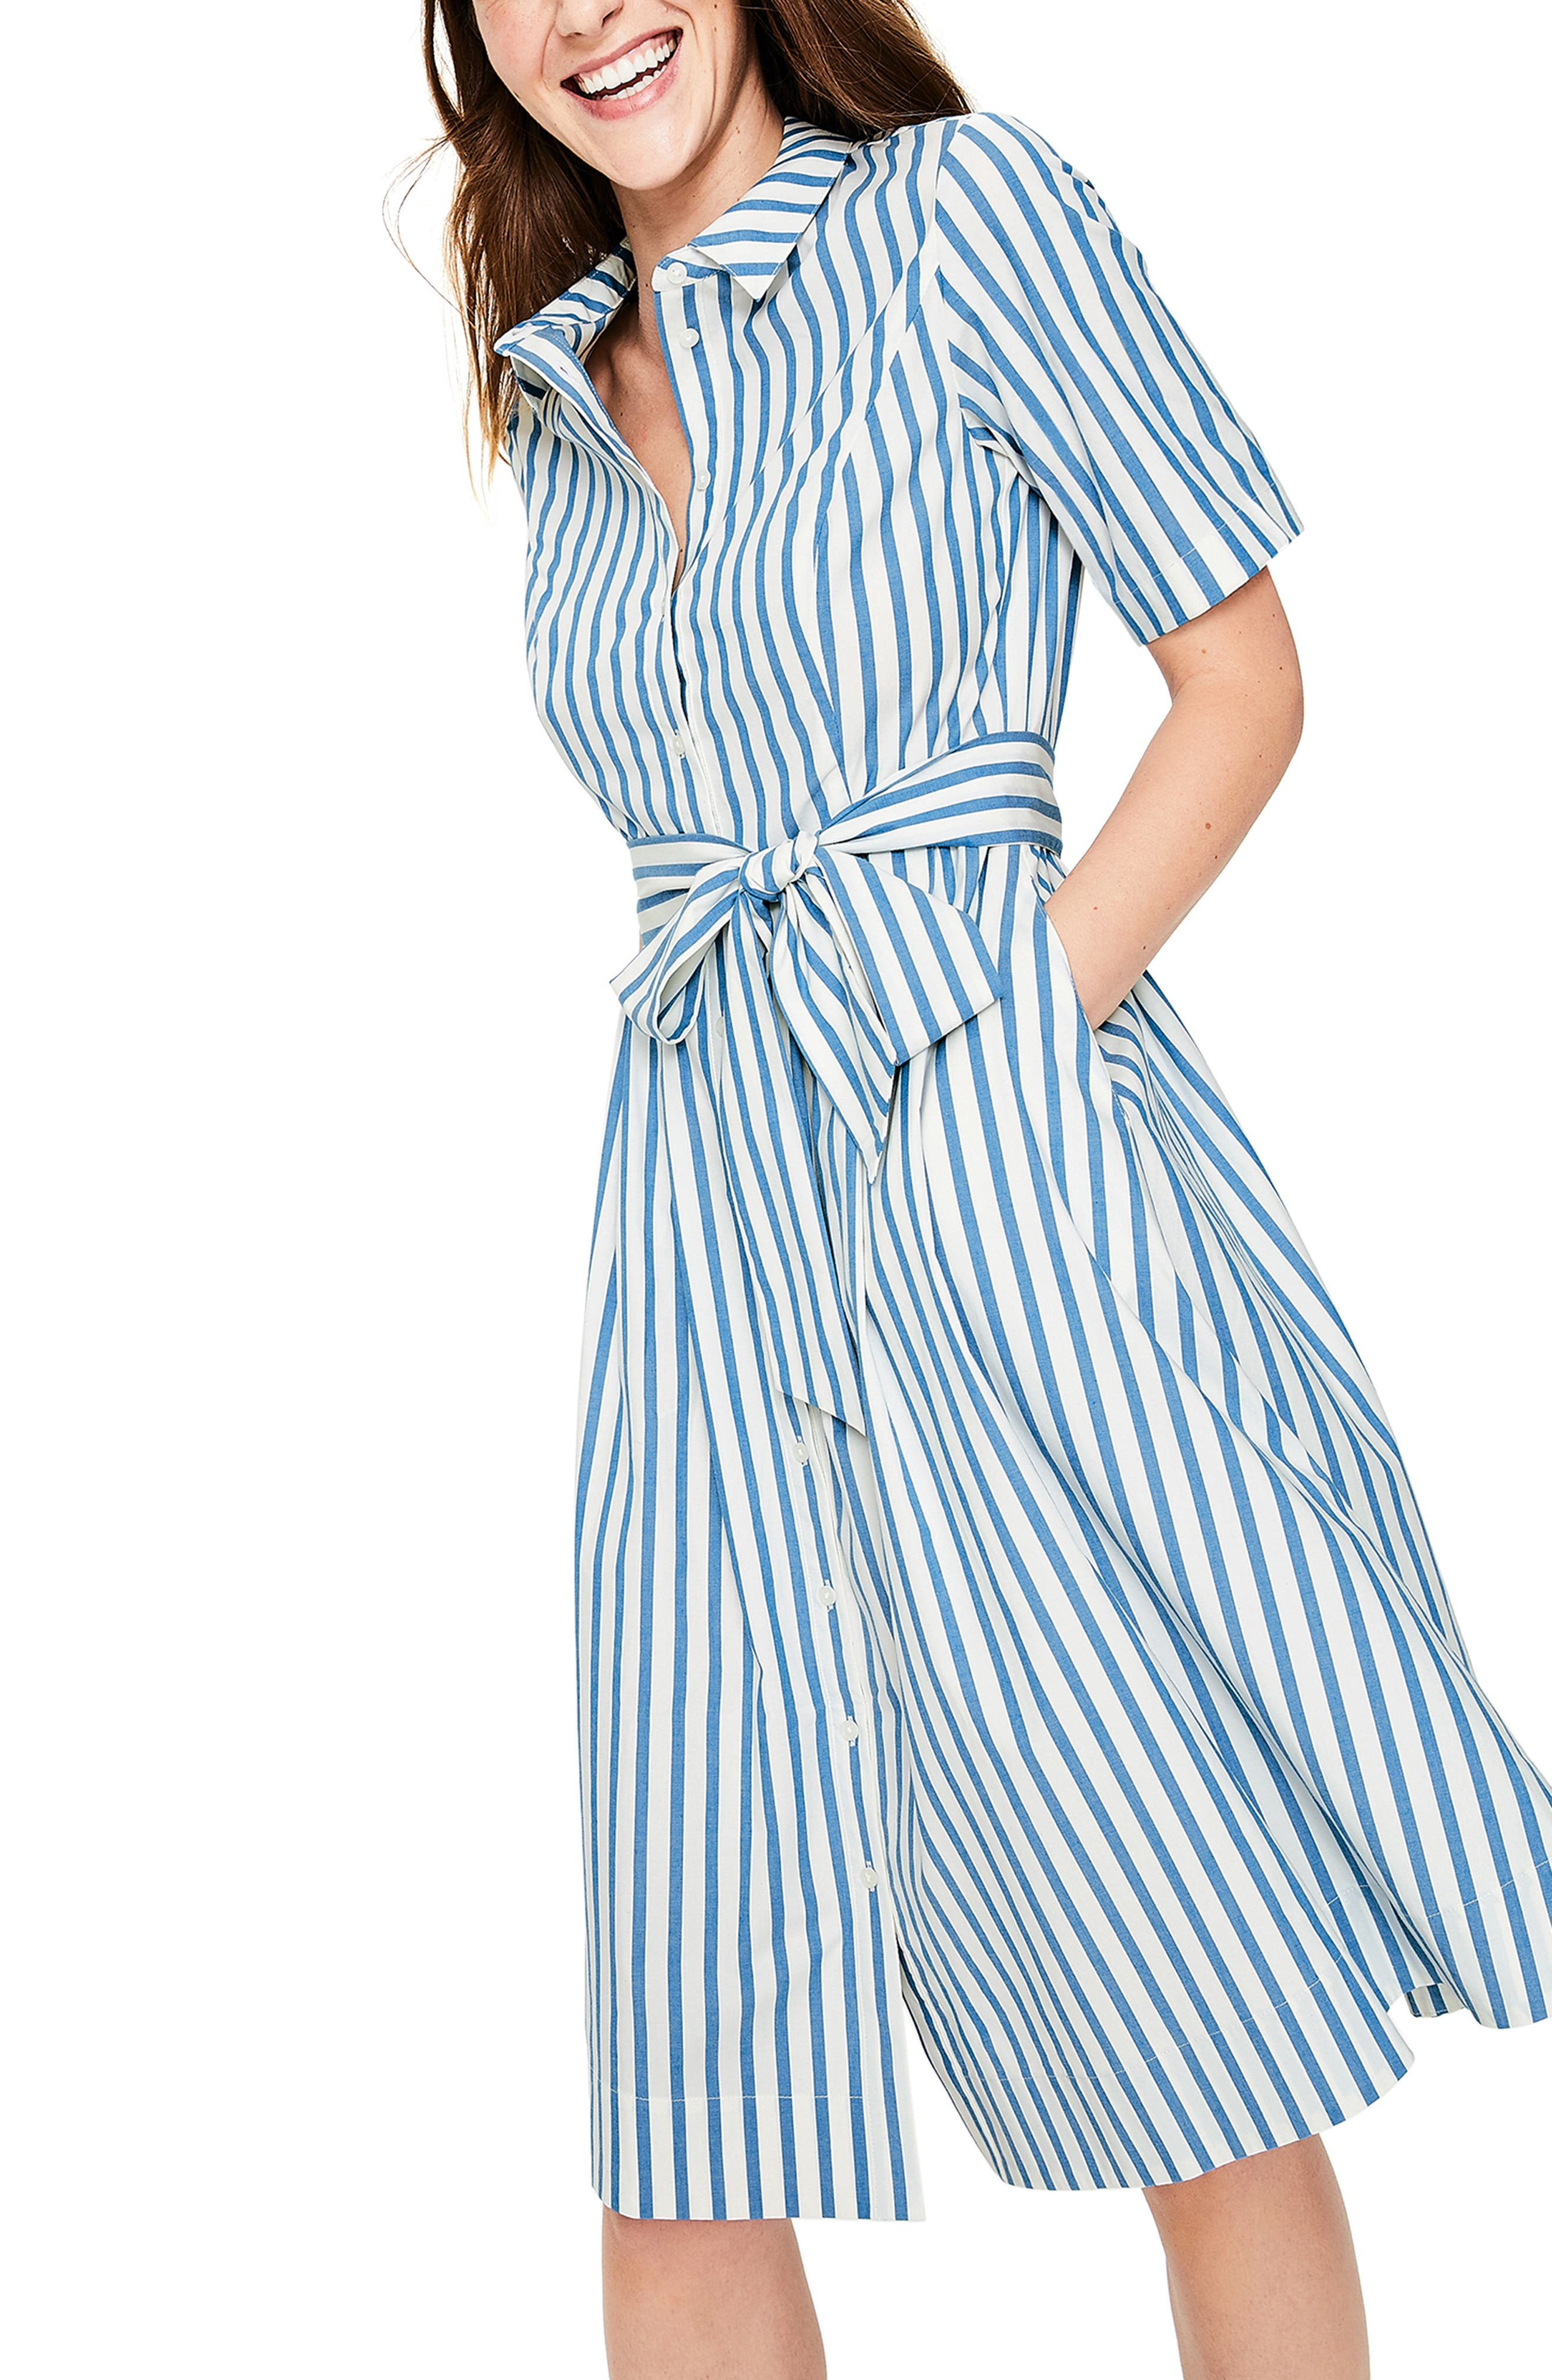 BODEN, Anastasia Tie Front Shirtdress, Main thumbnail 1, color, 454